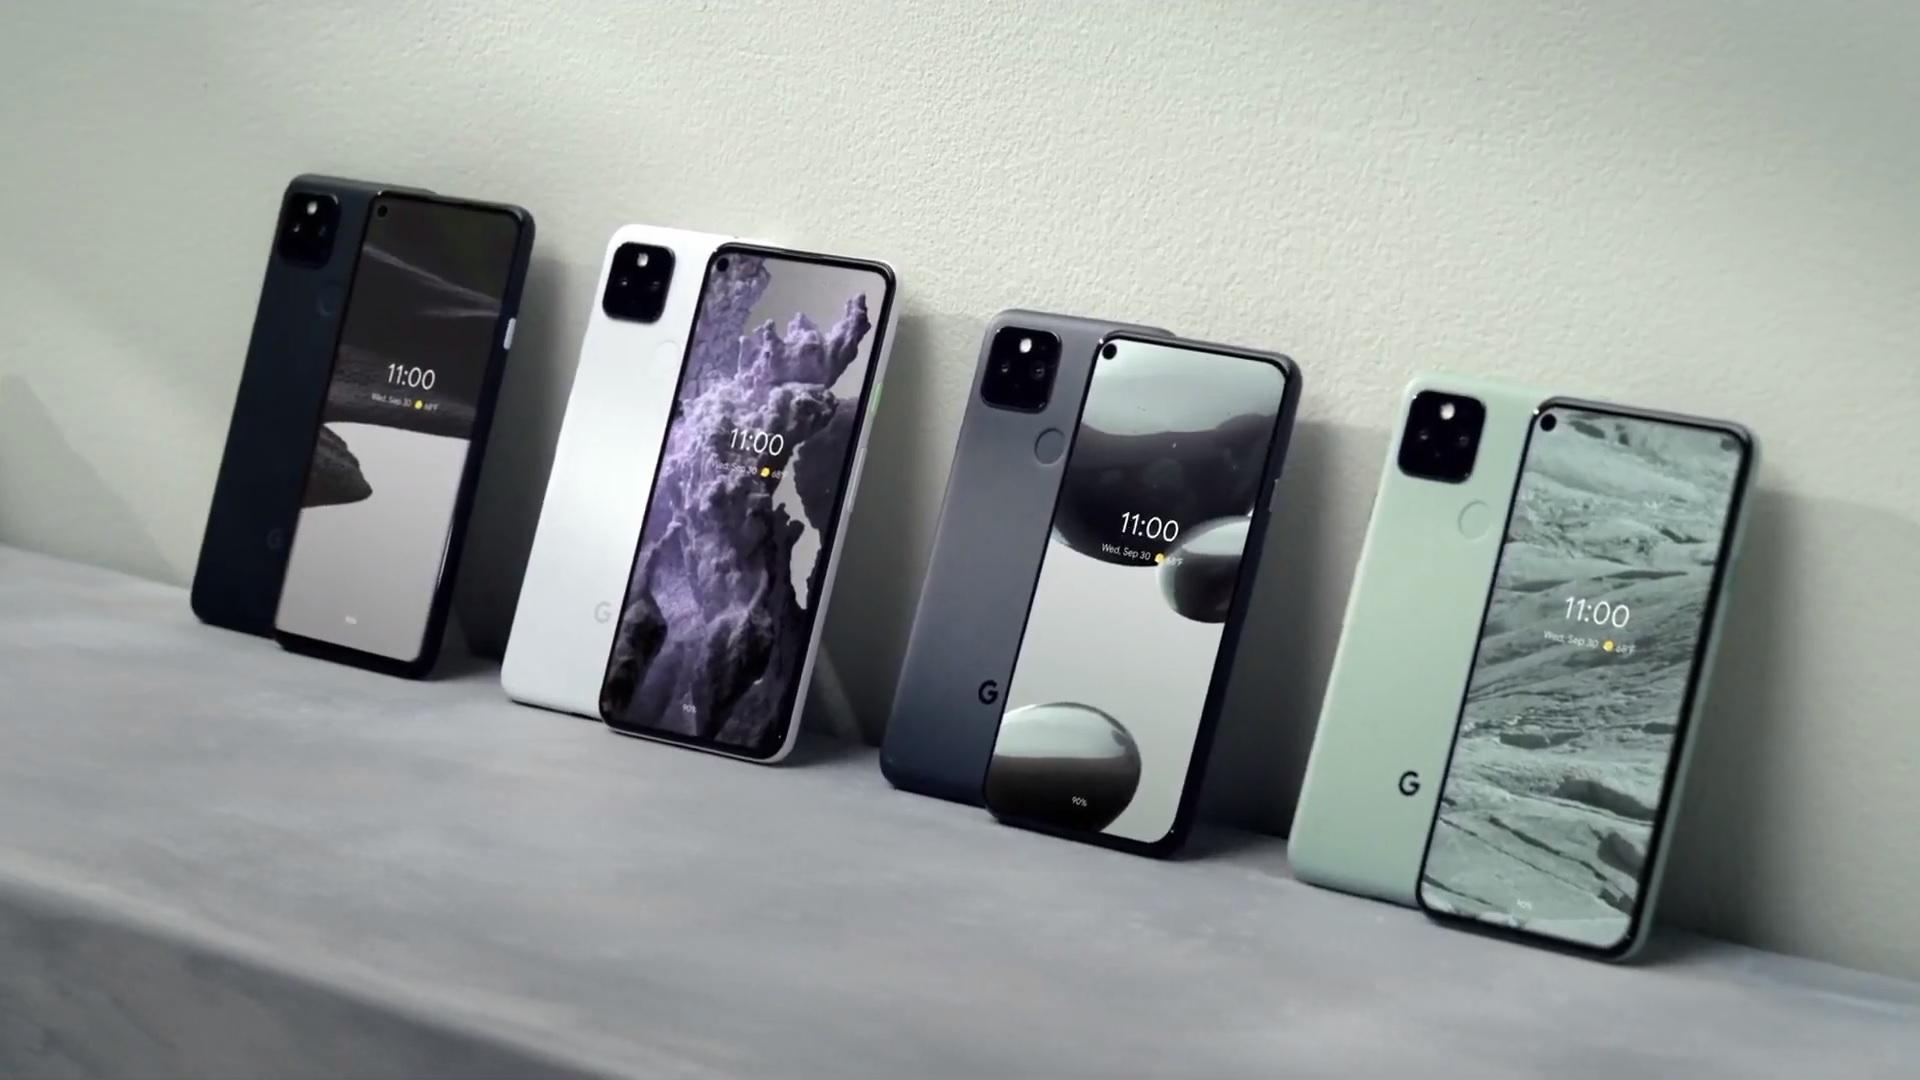 smartfon Google Pixel 5 Pixel 4a 5G smartphone